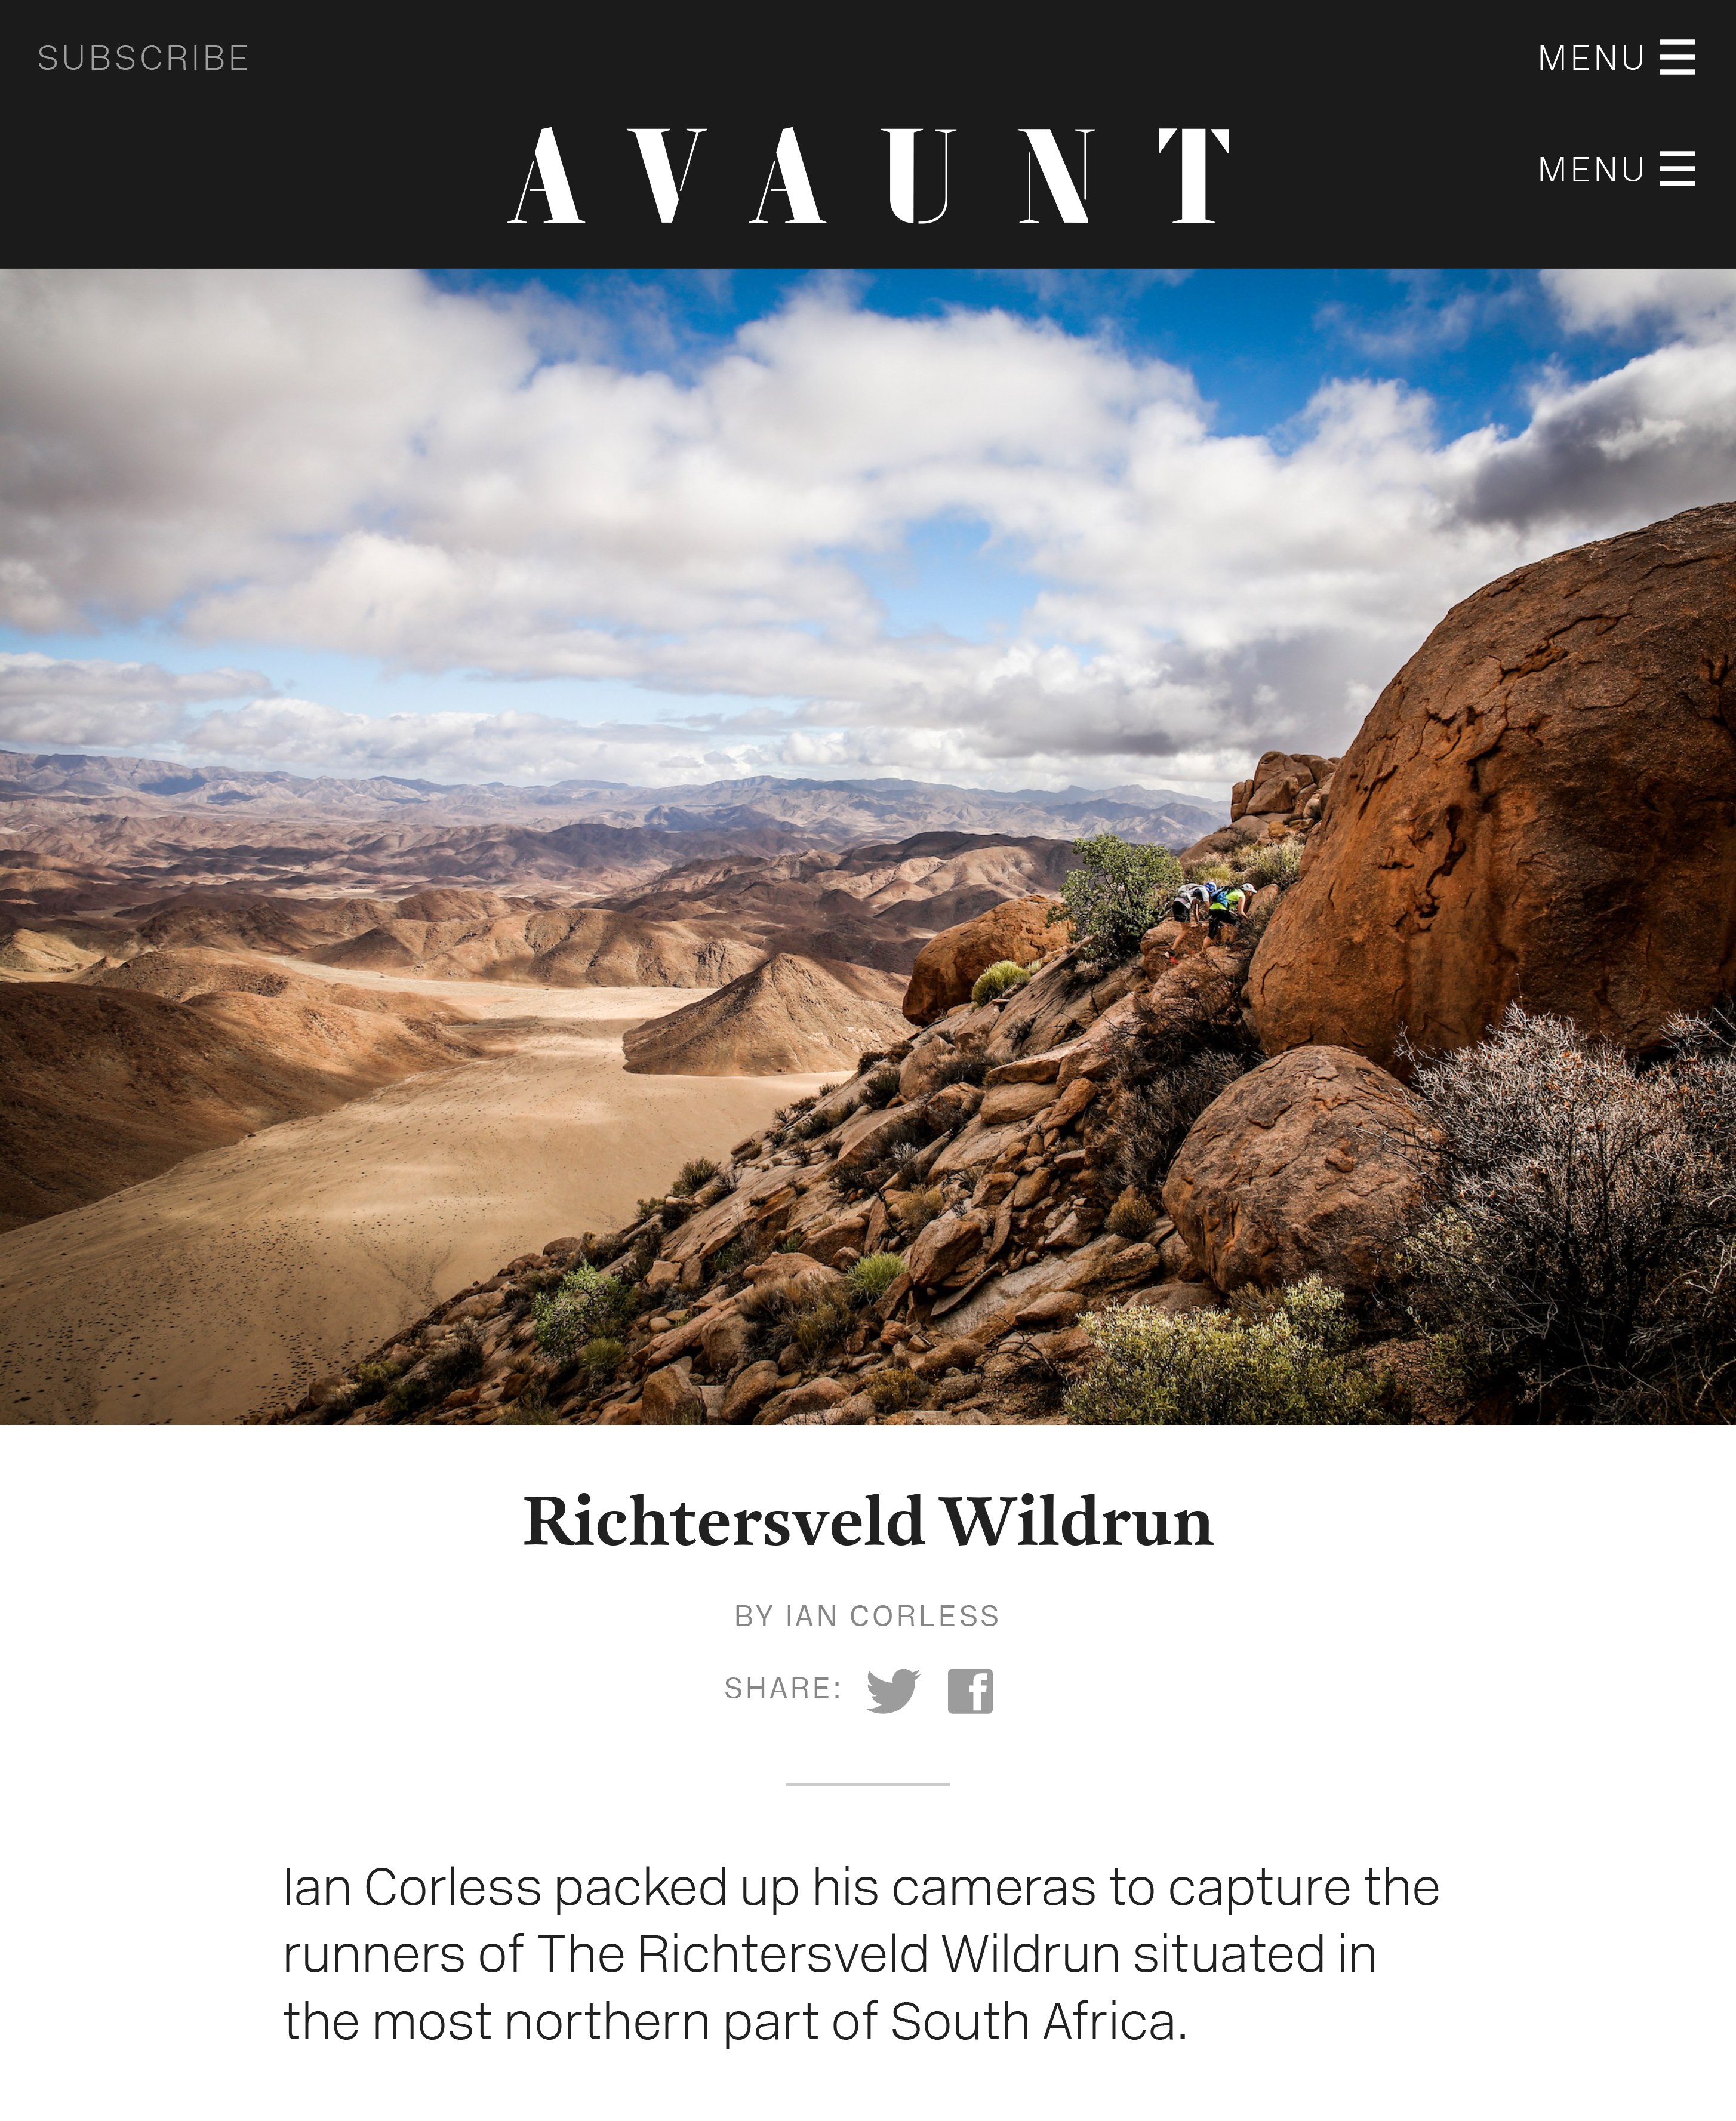 Richtersveld Wildrun | Avaunt Magazine-1